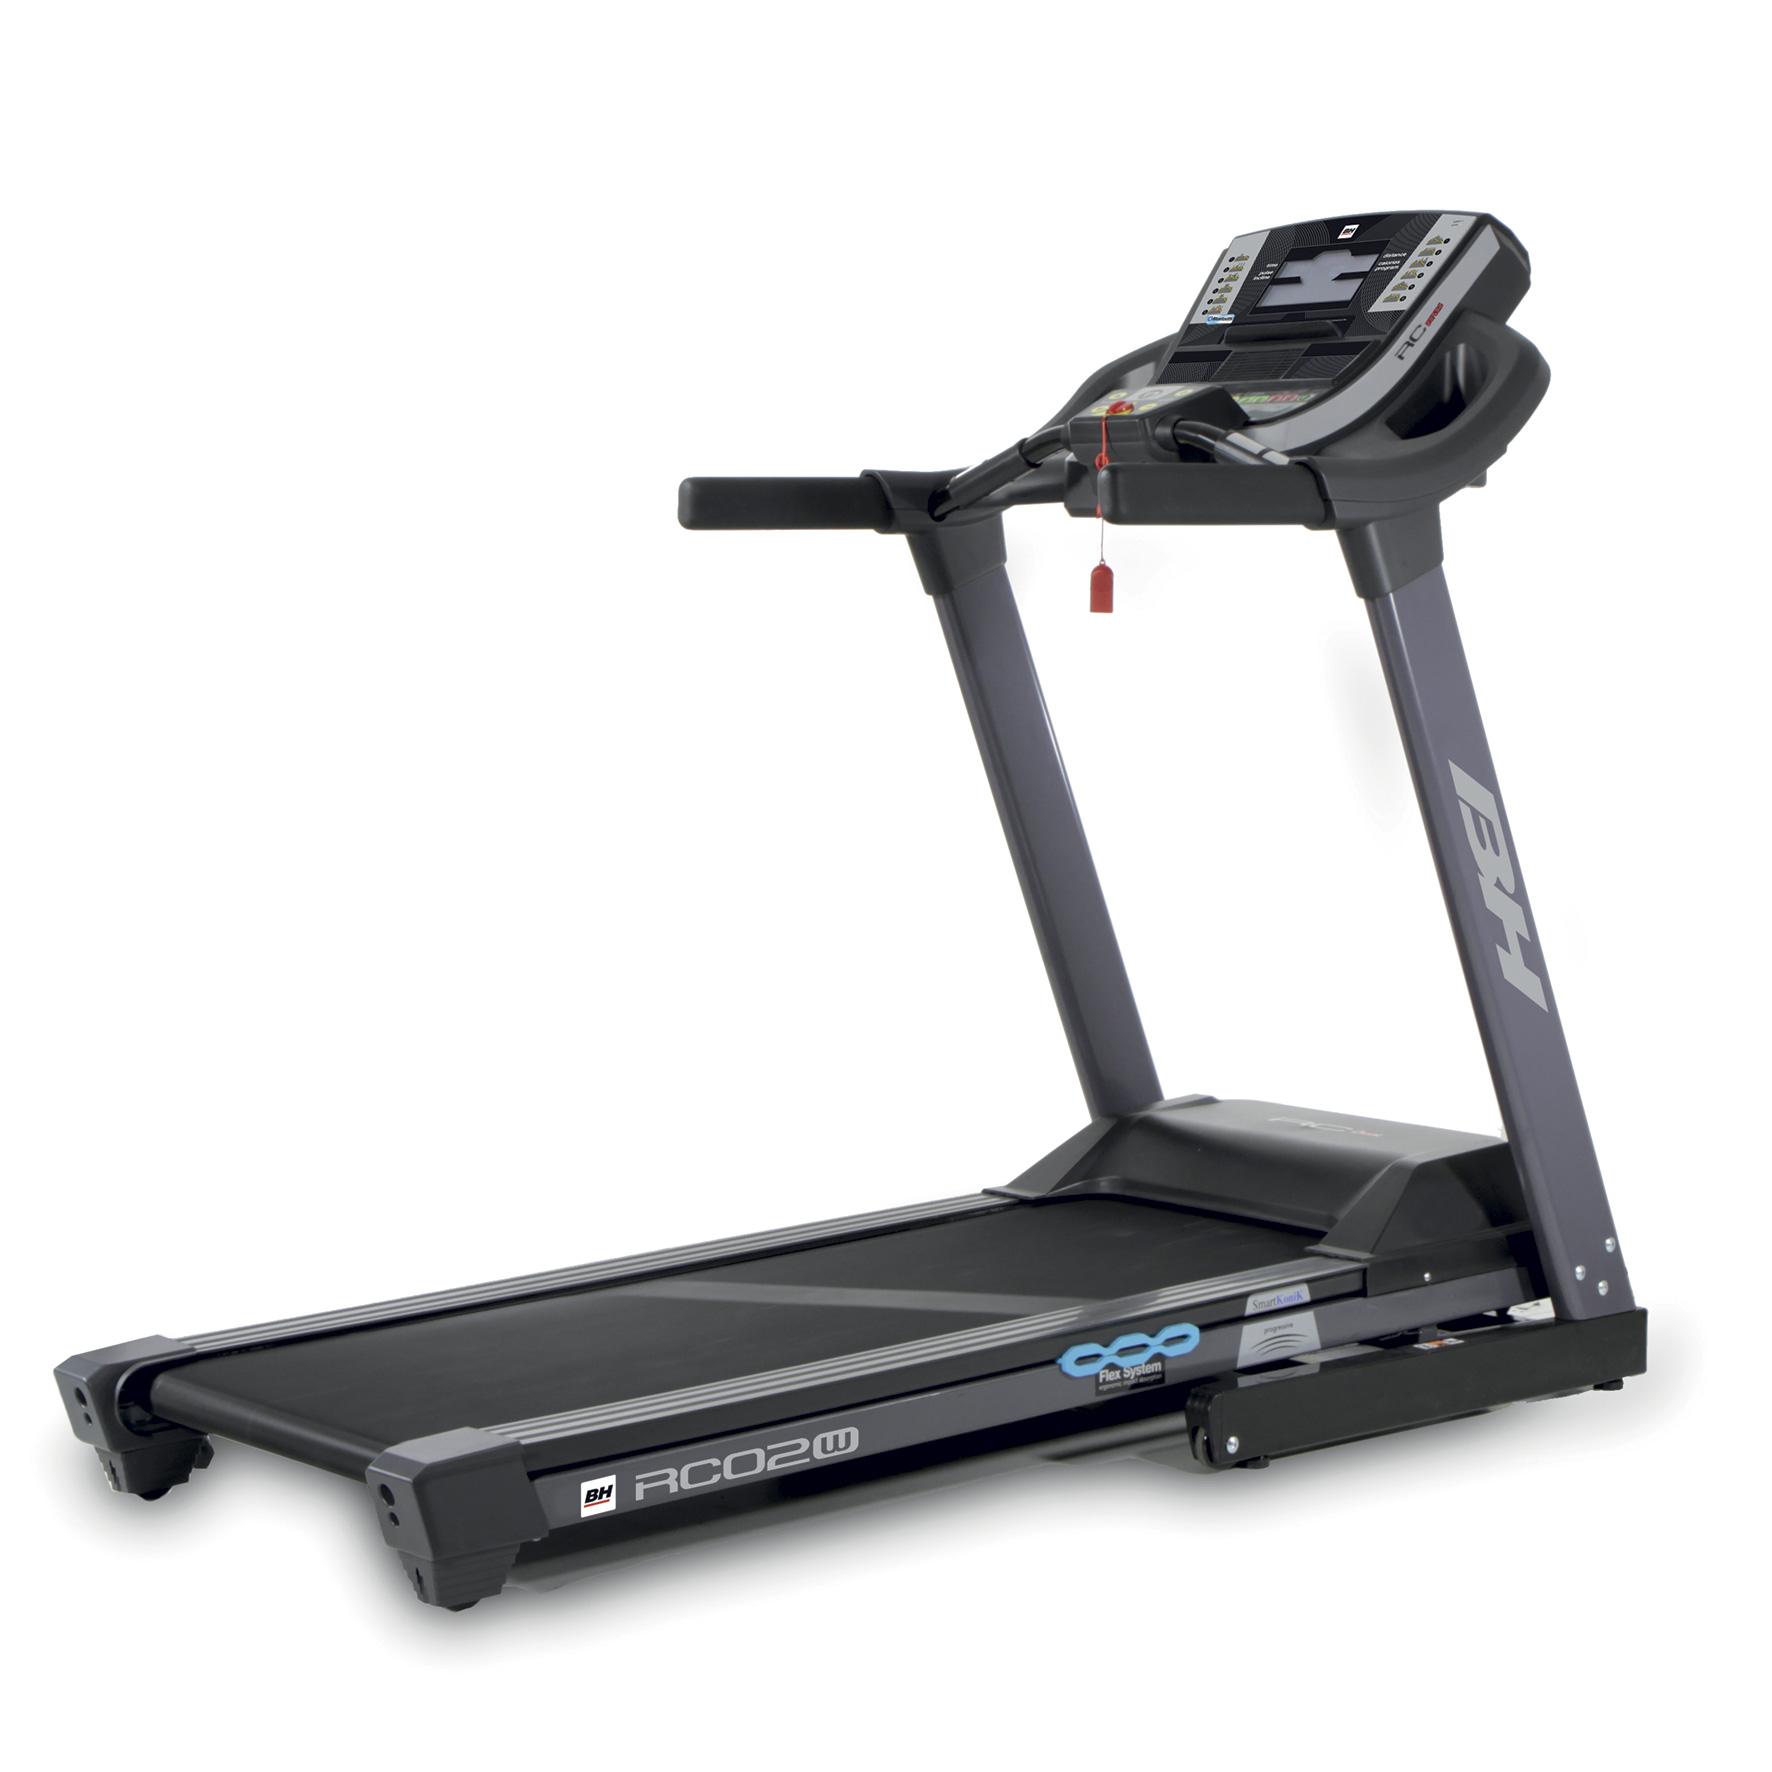 Bh fitness i.RC02W